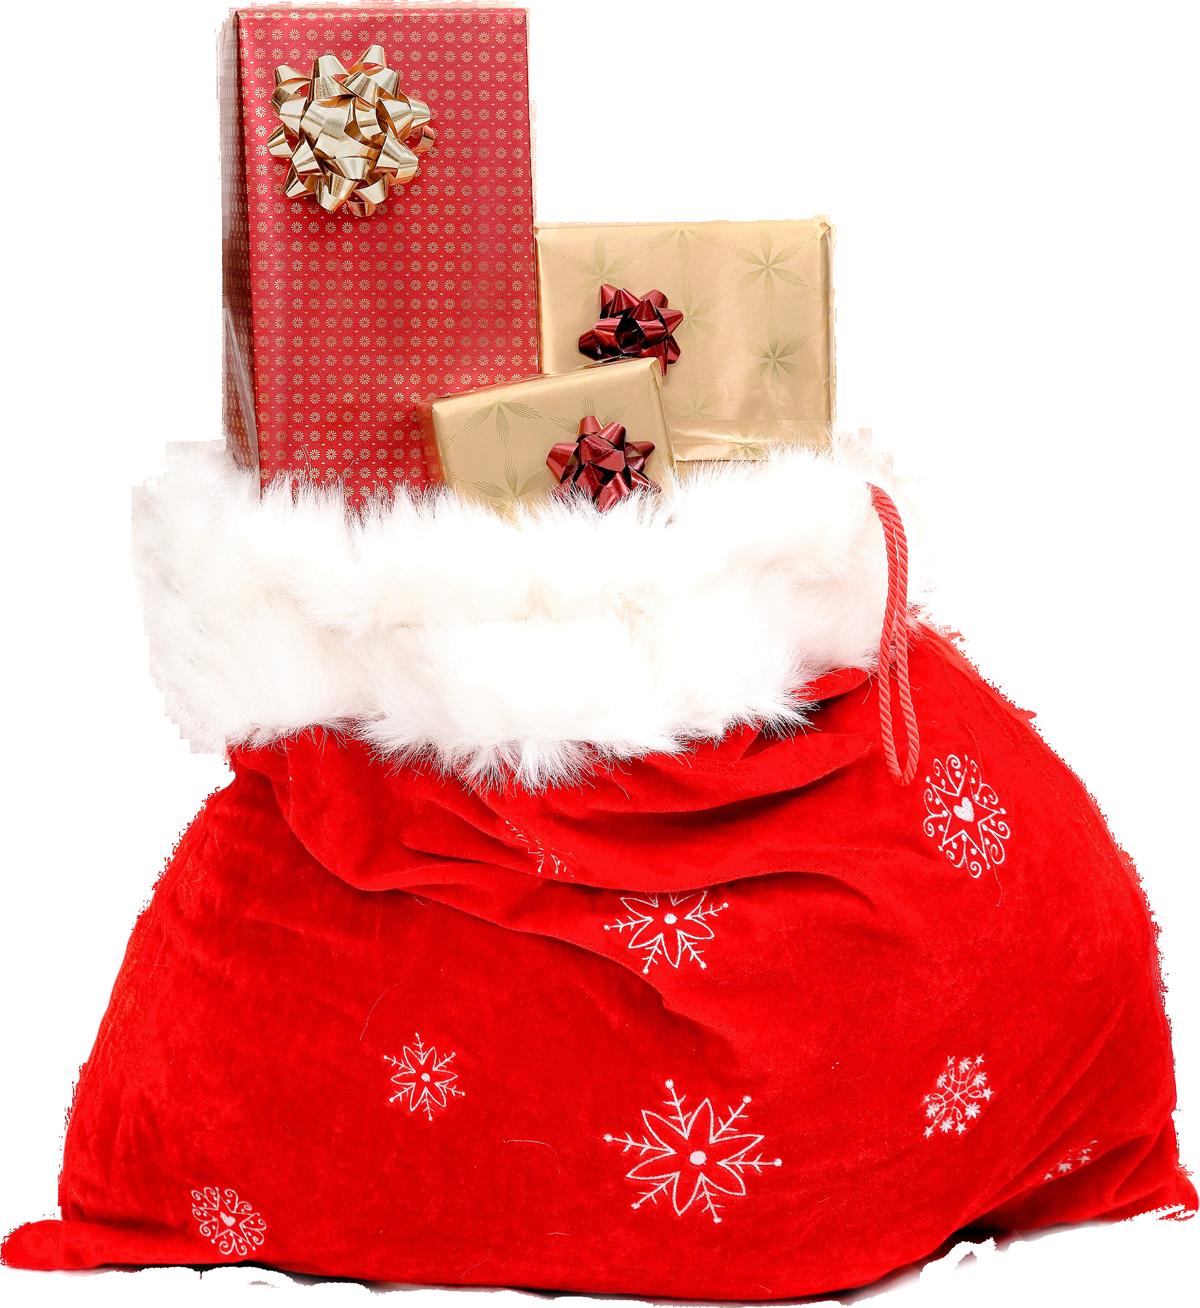 Christmas Sack with Gifts PNG Image